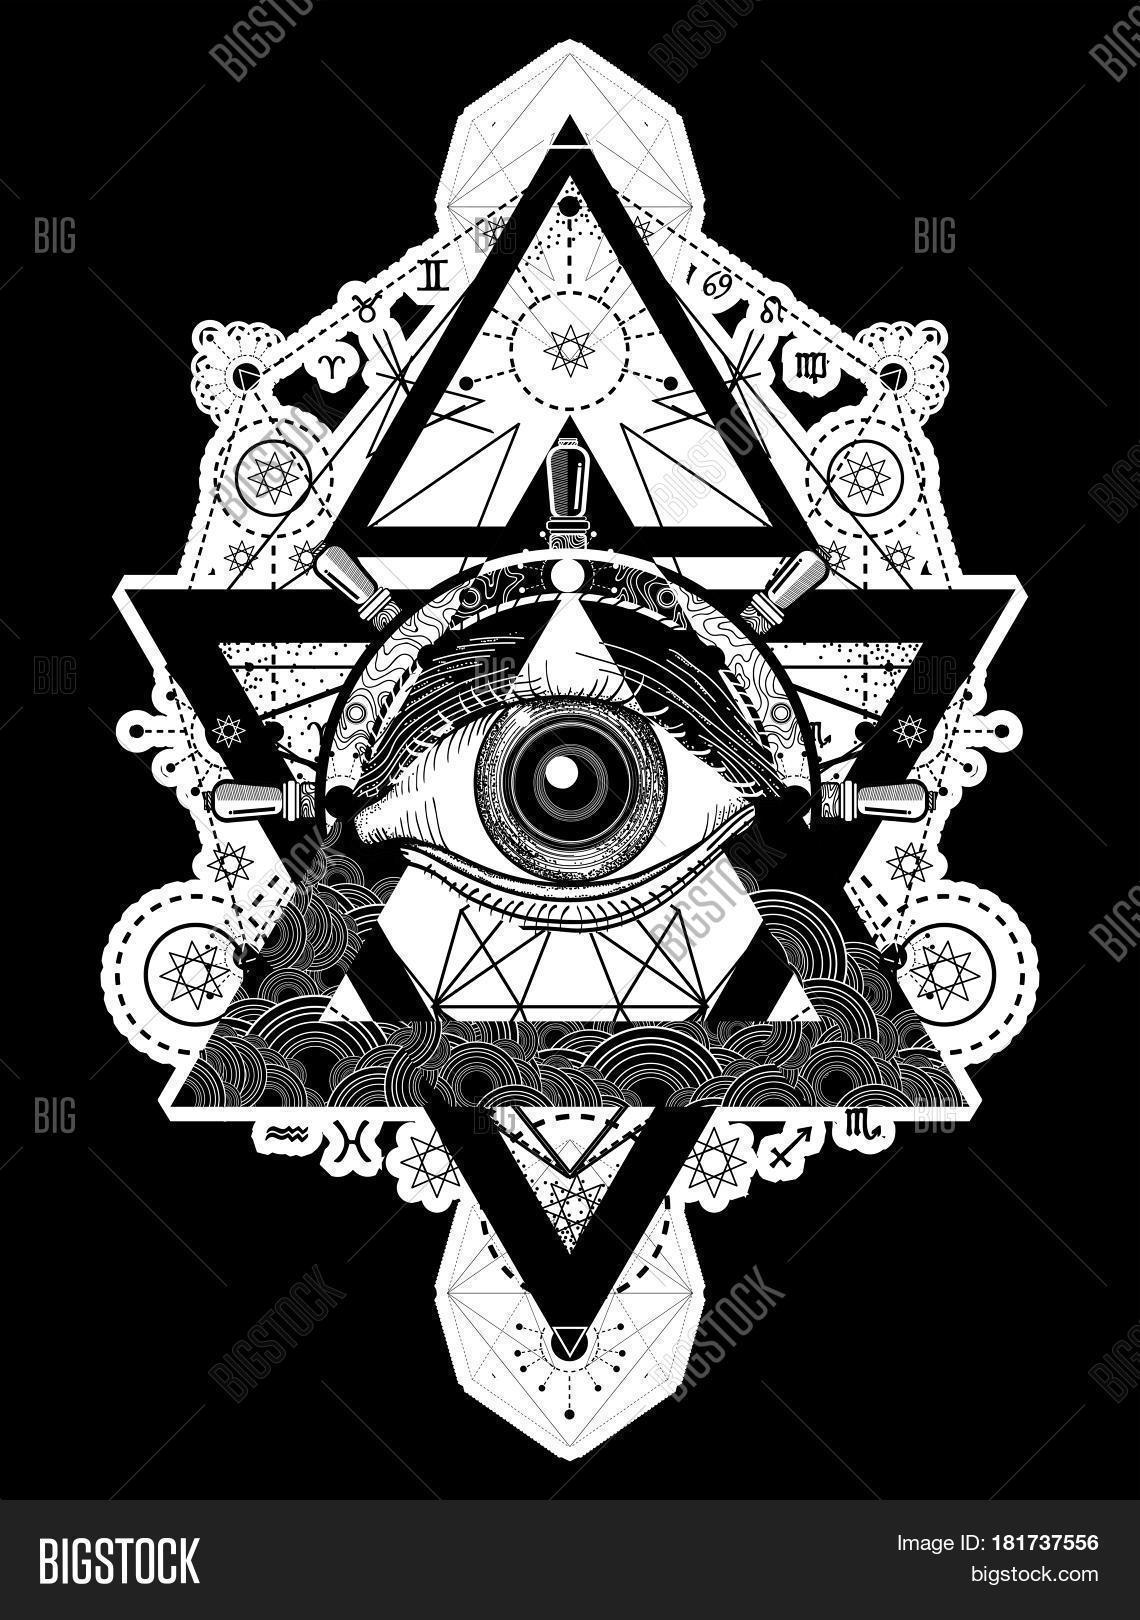 All Seeing Eye Tattoo Art Vector Freemason And Spiritual Symbols Alchemy Medieval Religion Occultism